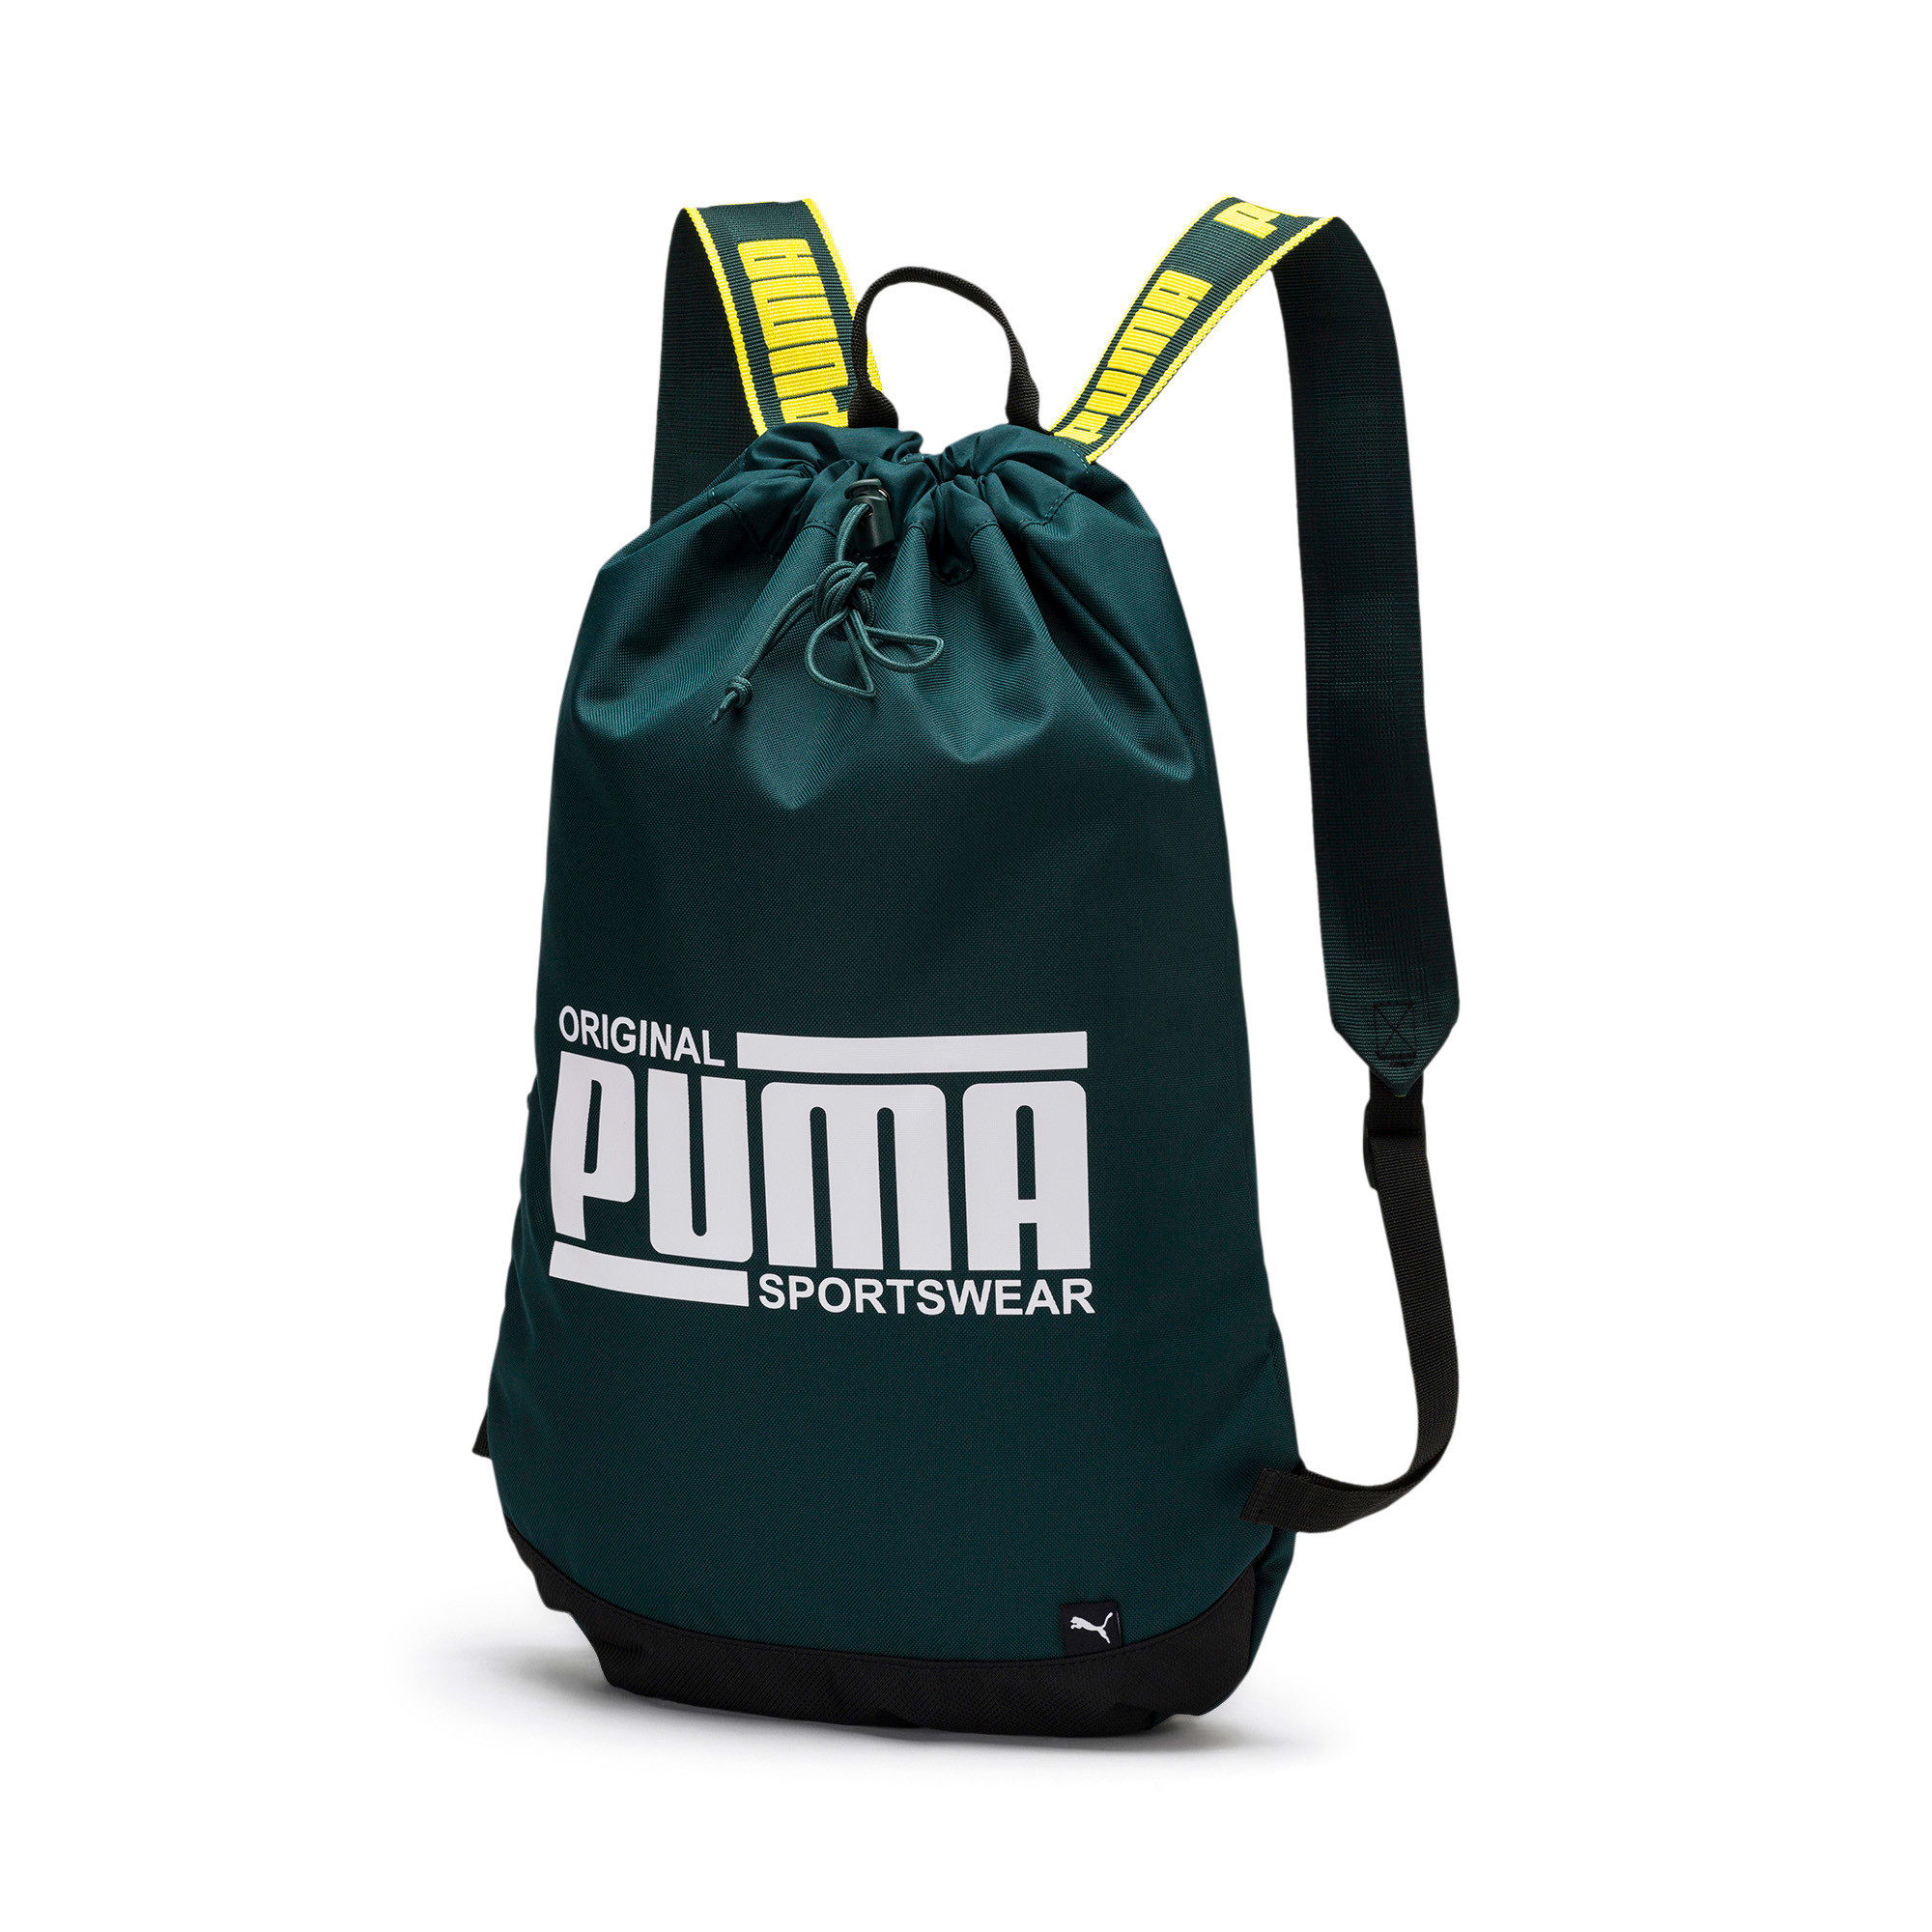 Thumbnail 1 of PUMA Sole Smart Bag, Ponderosa Pine-Yellow, medium